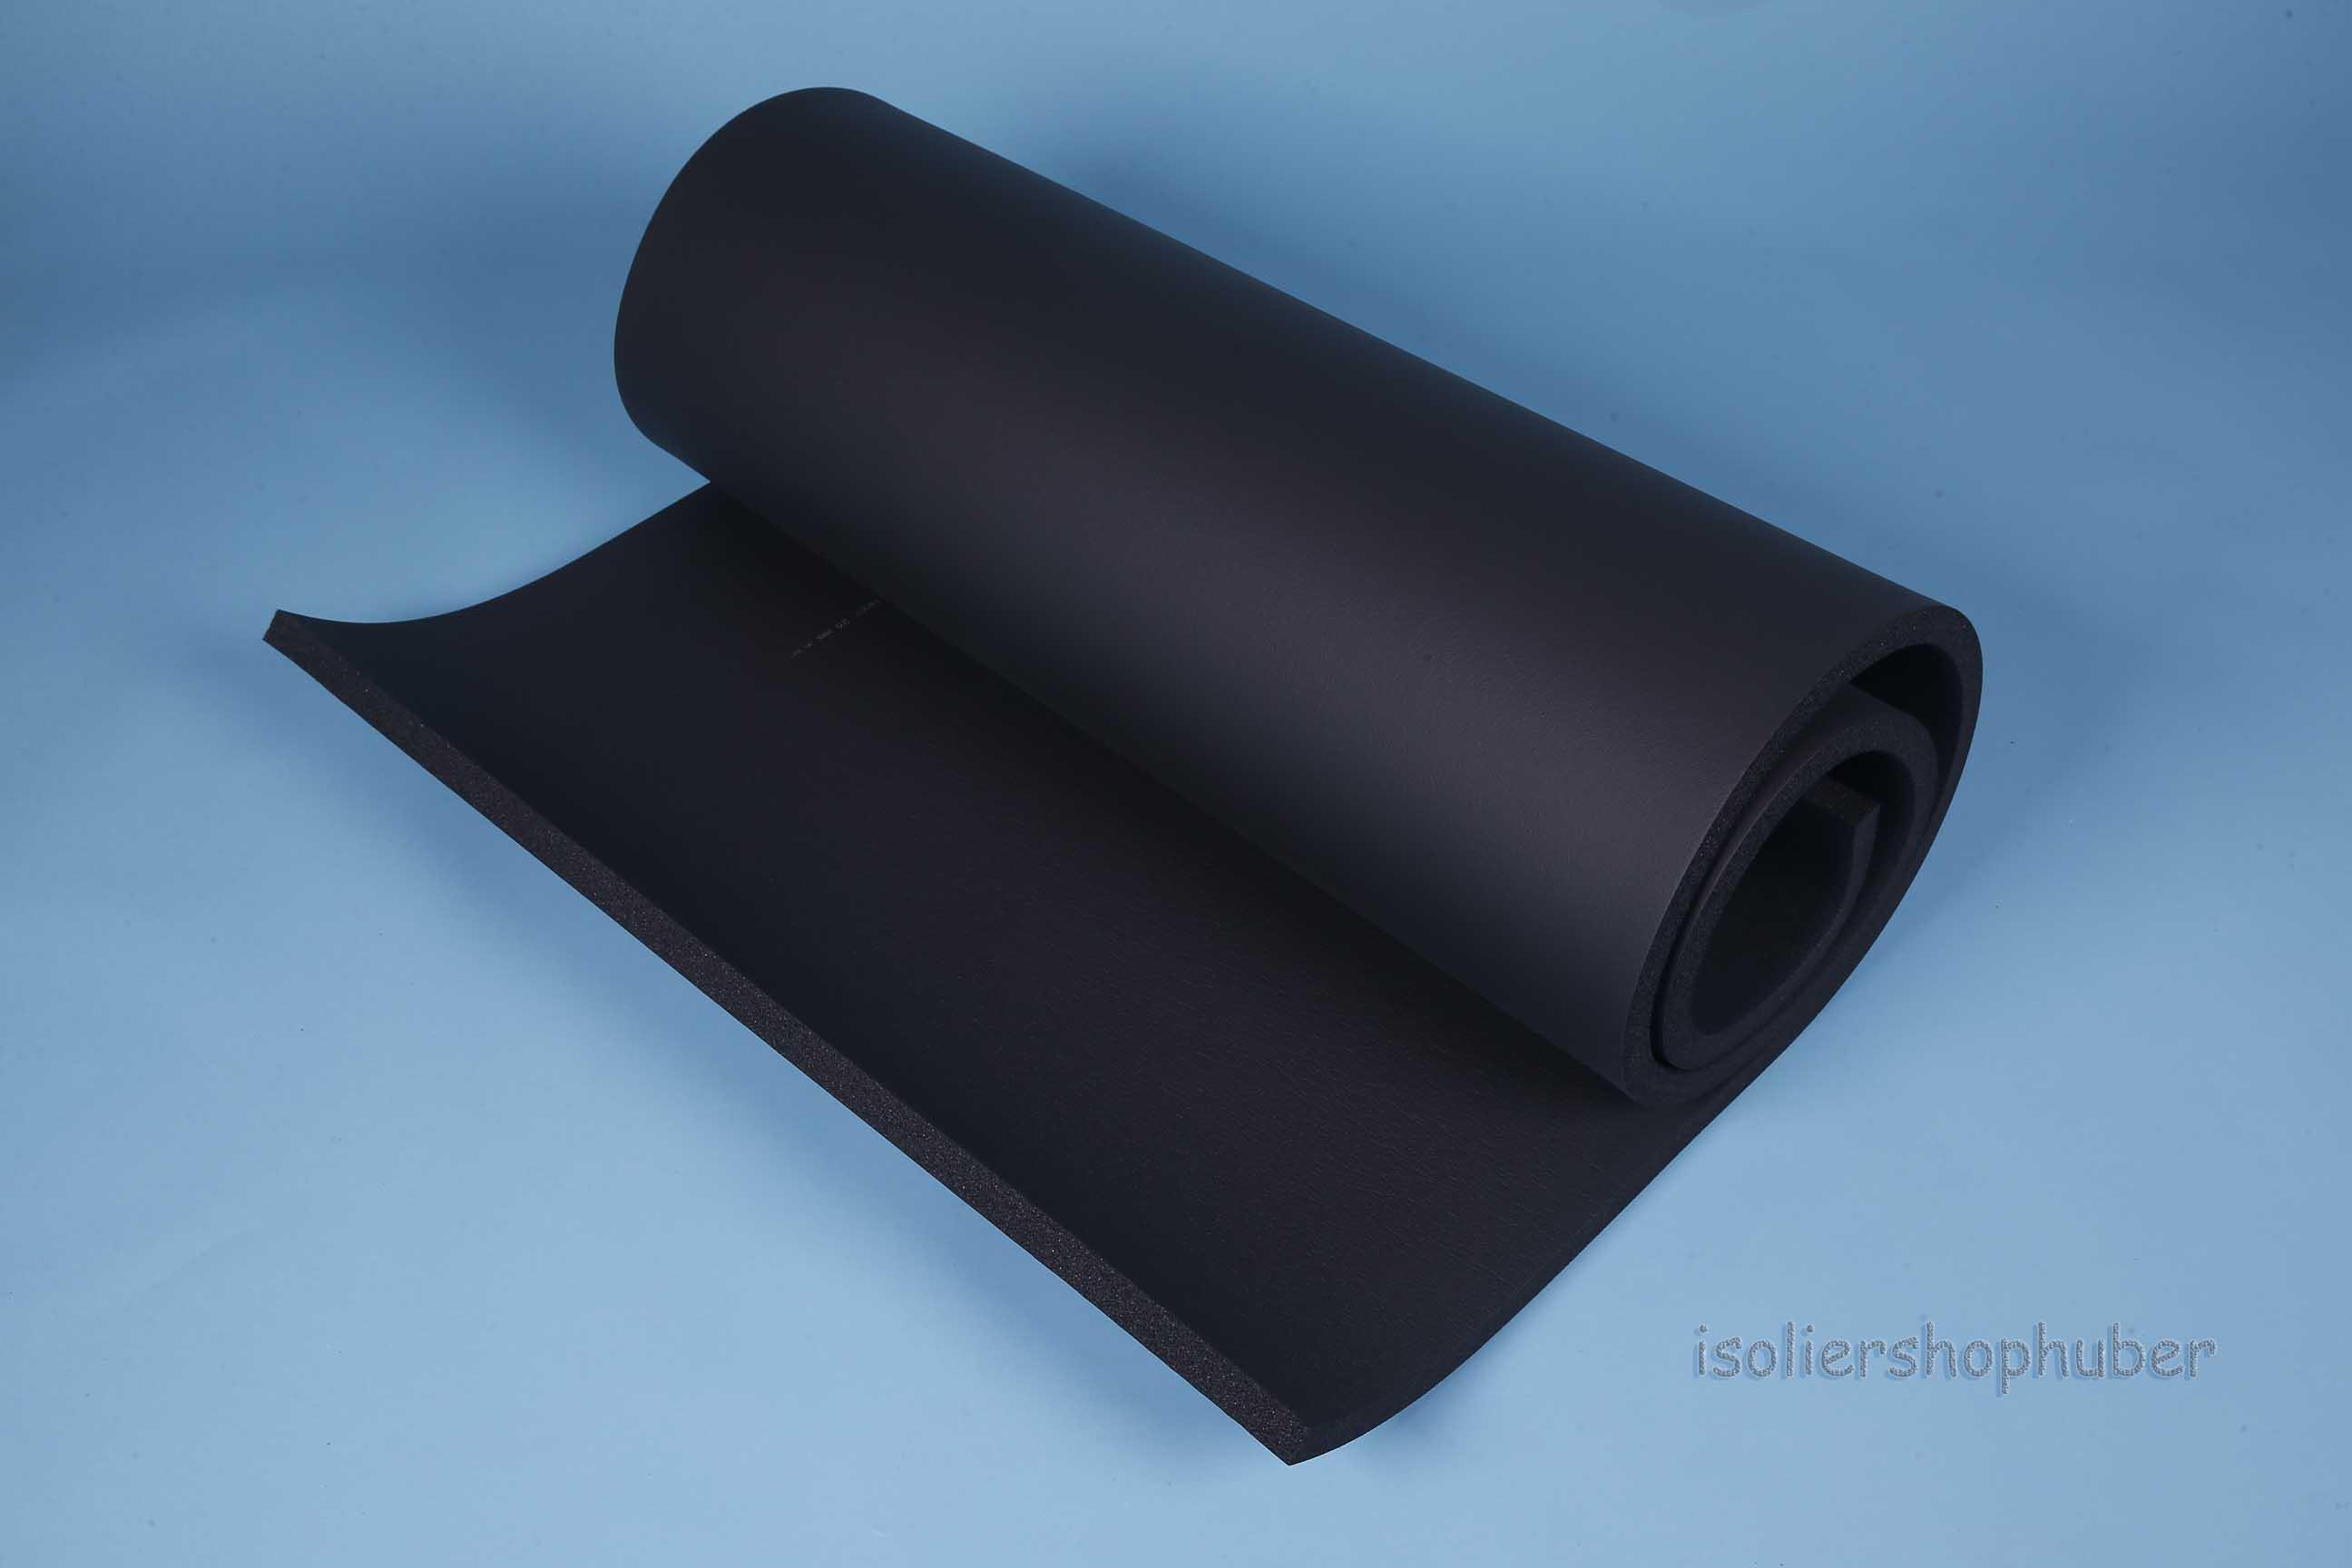 isoliershophuber 1 m ht armaflex platte 19 mm kautschuk. Black Bedroom Furniture Sets. Home Design Ideas